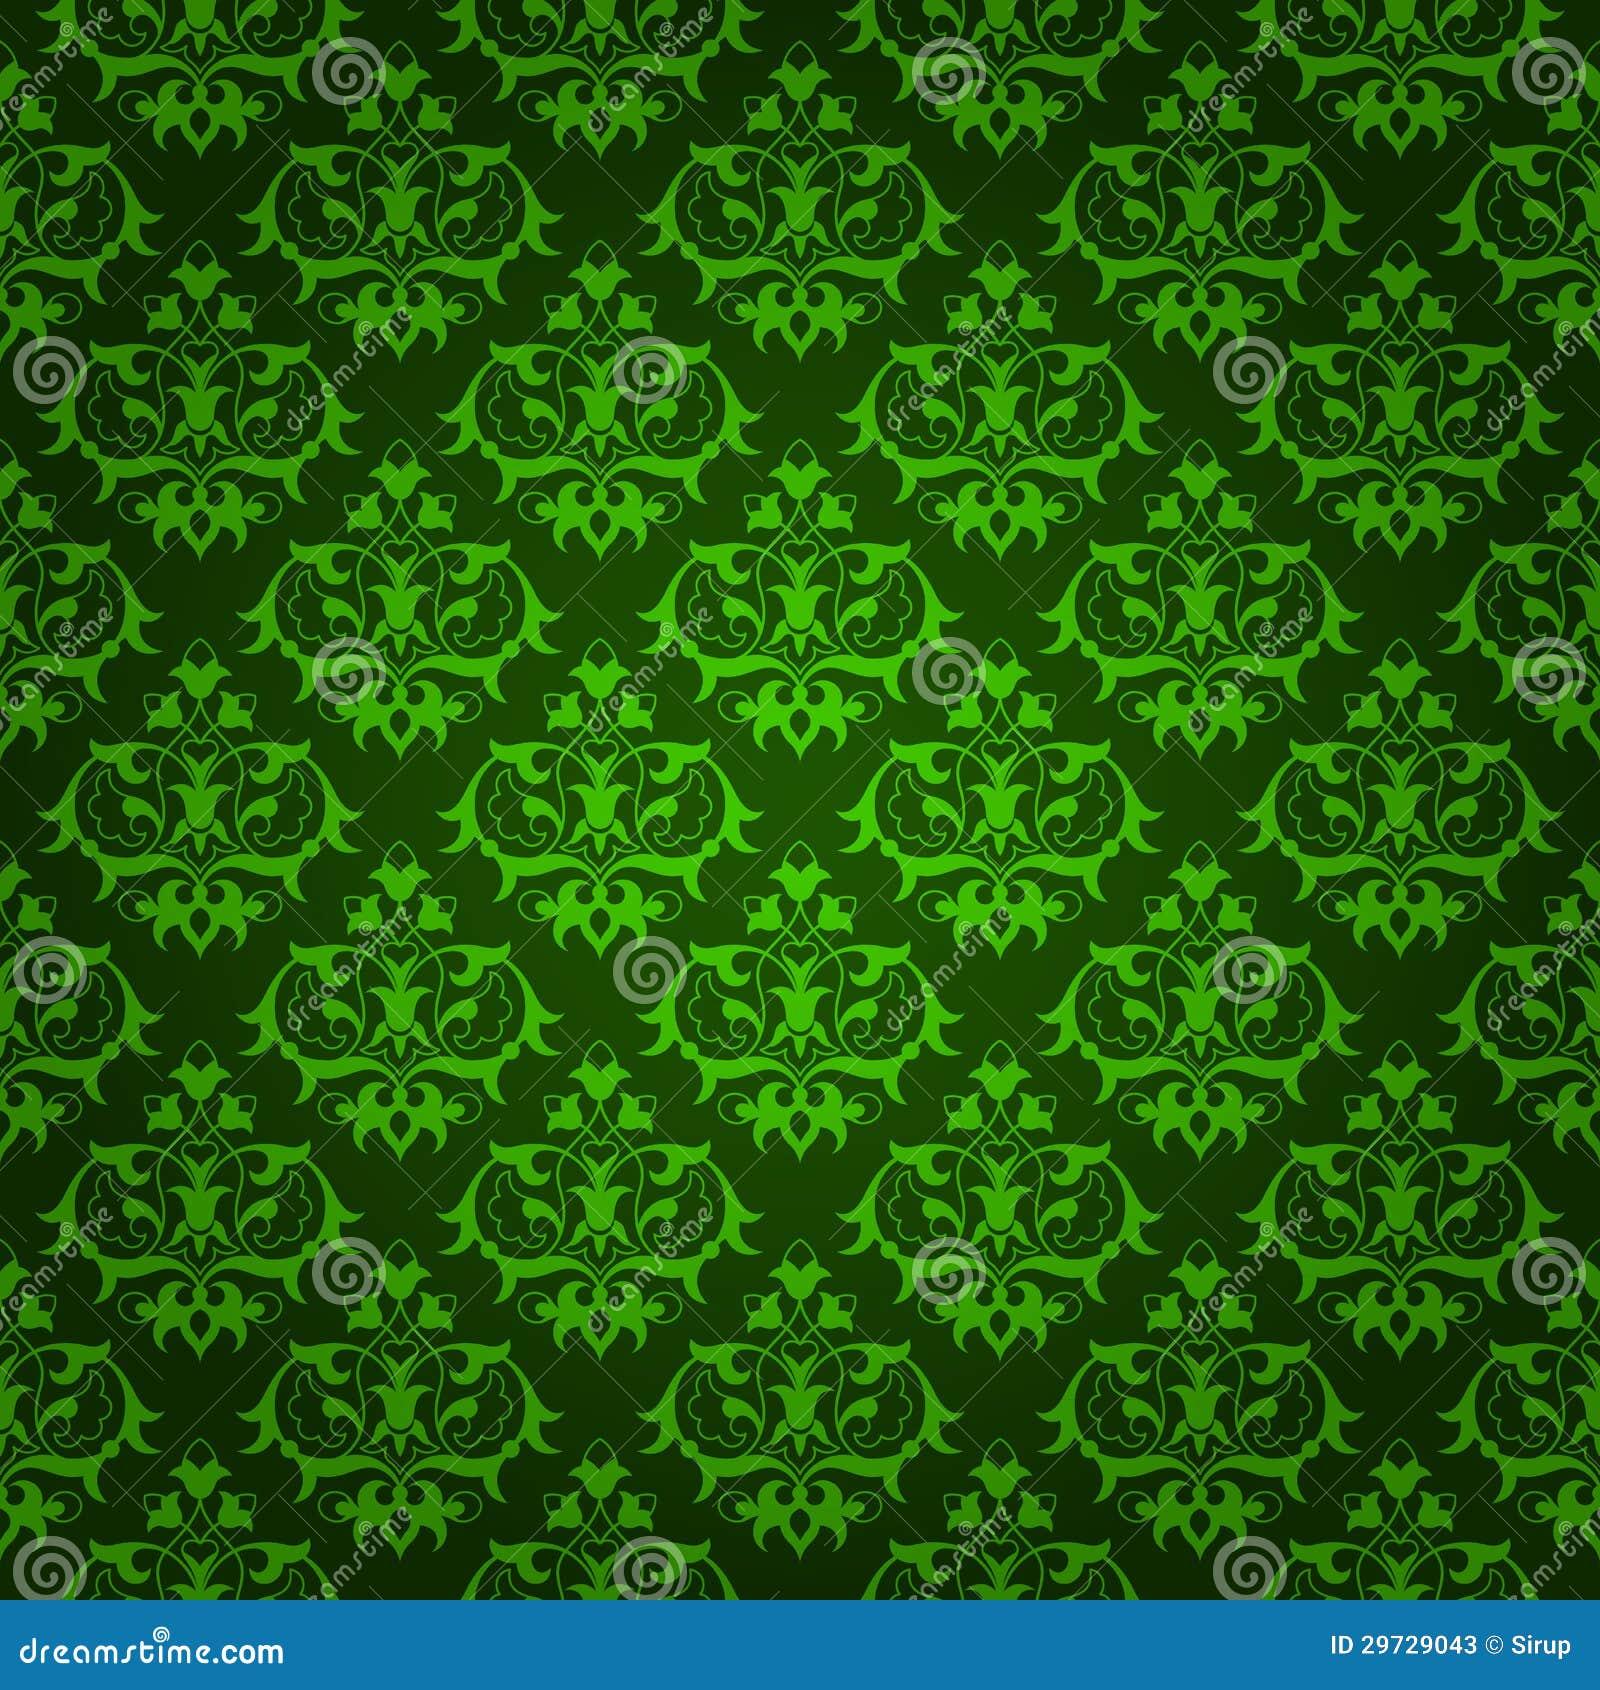 elegant green backgrounds - photo #6